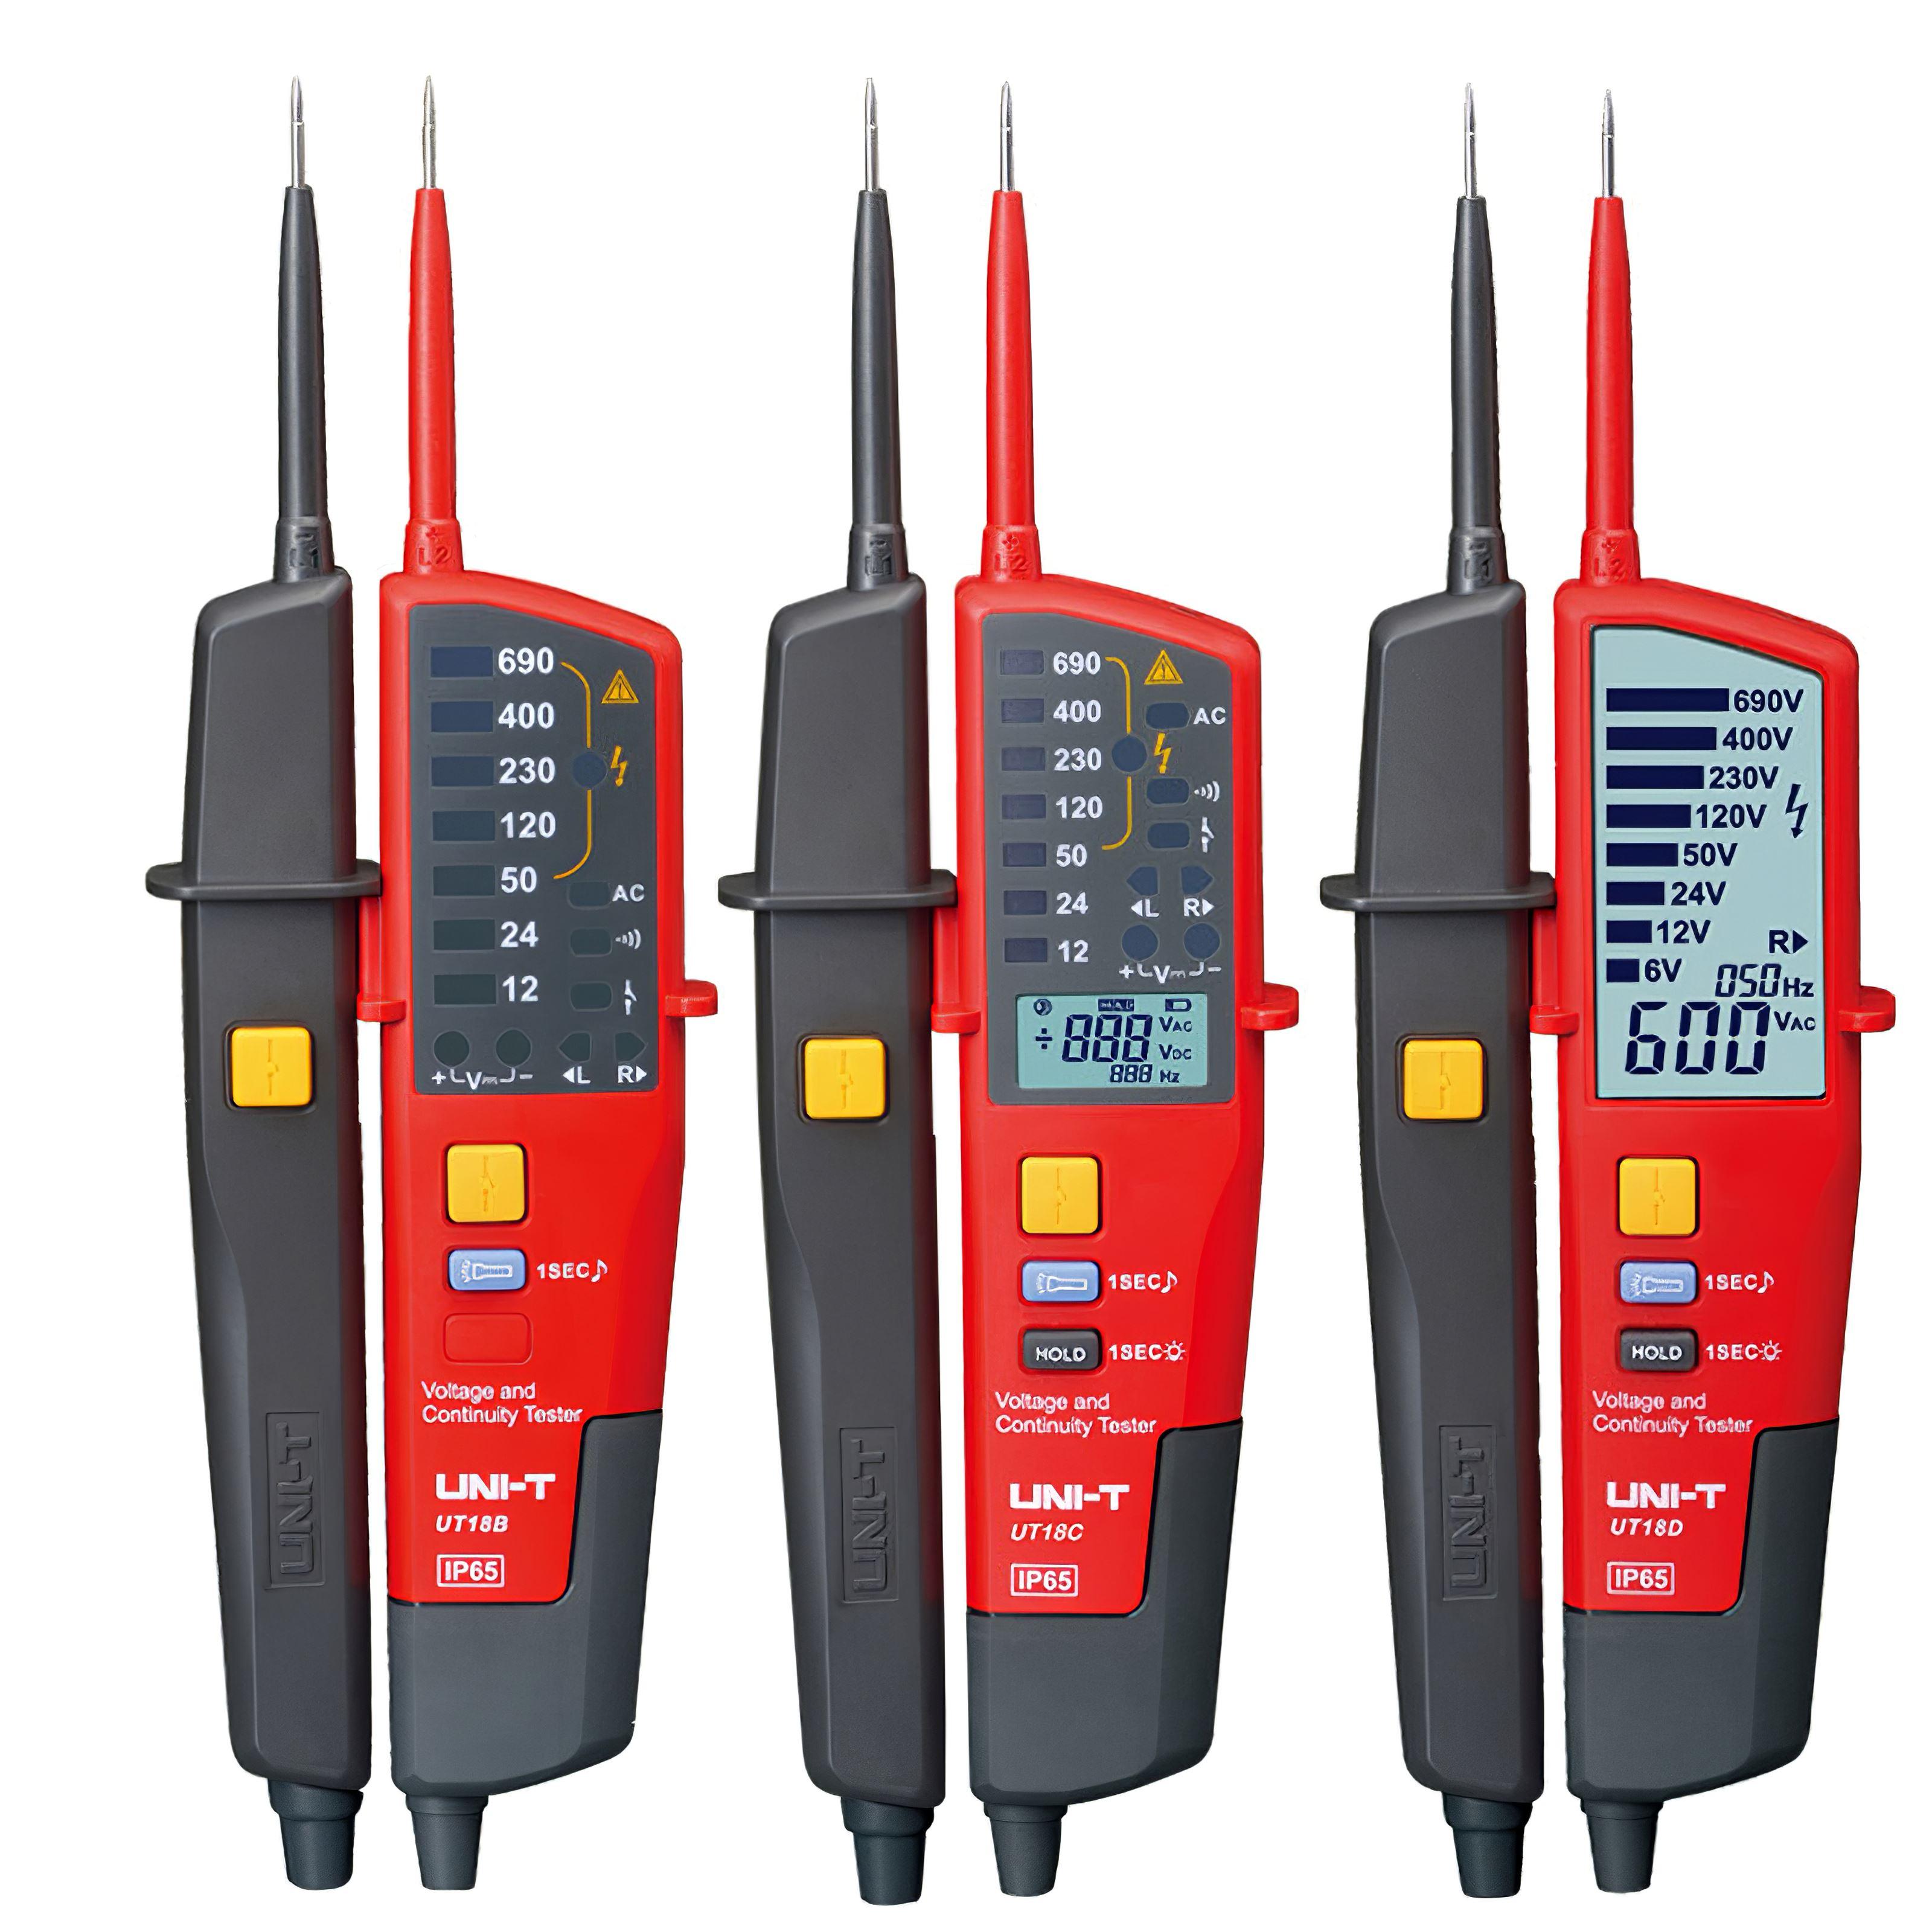 UNI-T UT15C UT18C الرقمية الجهد متر 24 فولت ~ 690 فولت التيار المتناوب/تيار مستمر جهاز قياس الجهد الكهربائي s شاشة الكريستال السائل السيارات المدى المرح...